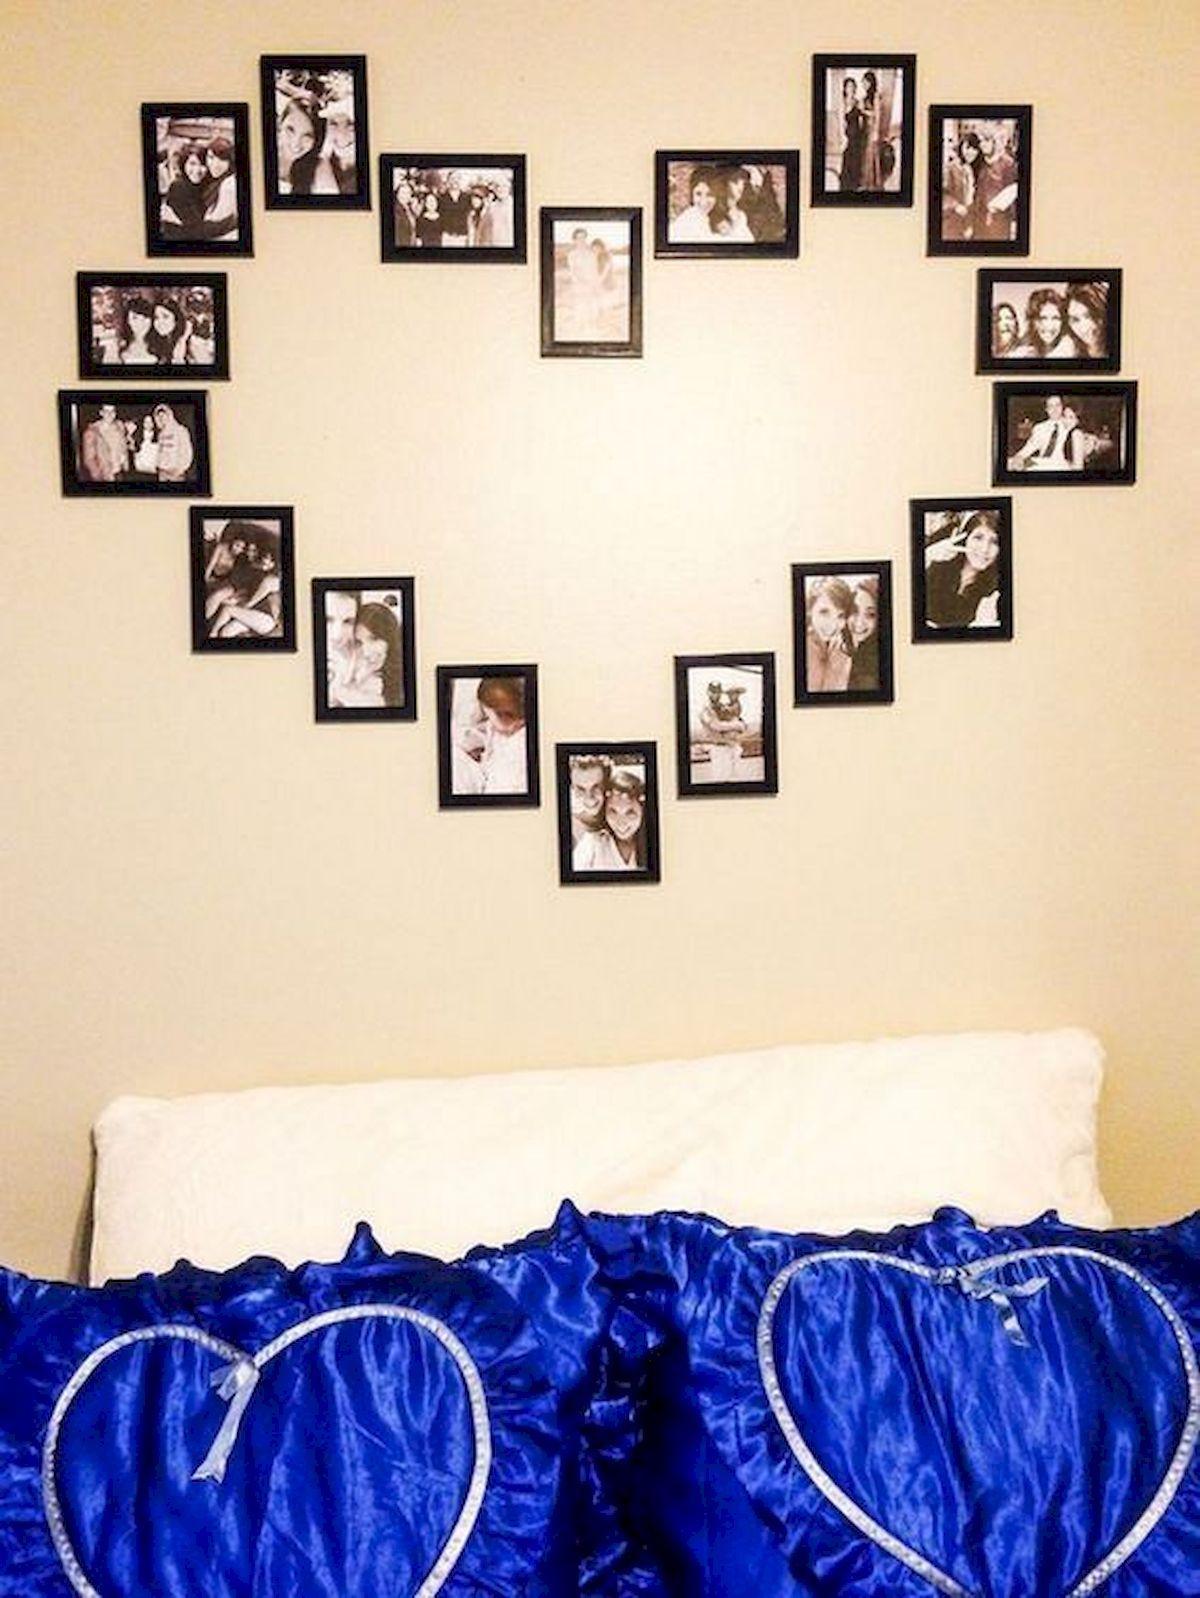 55 Romantic Diy Bedroom Decor For Couple Romantic Bedroom Decor Bedroom Decor For Couples Bedroom Diy